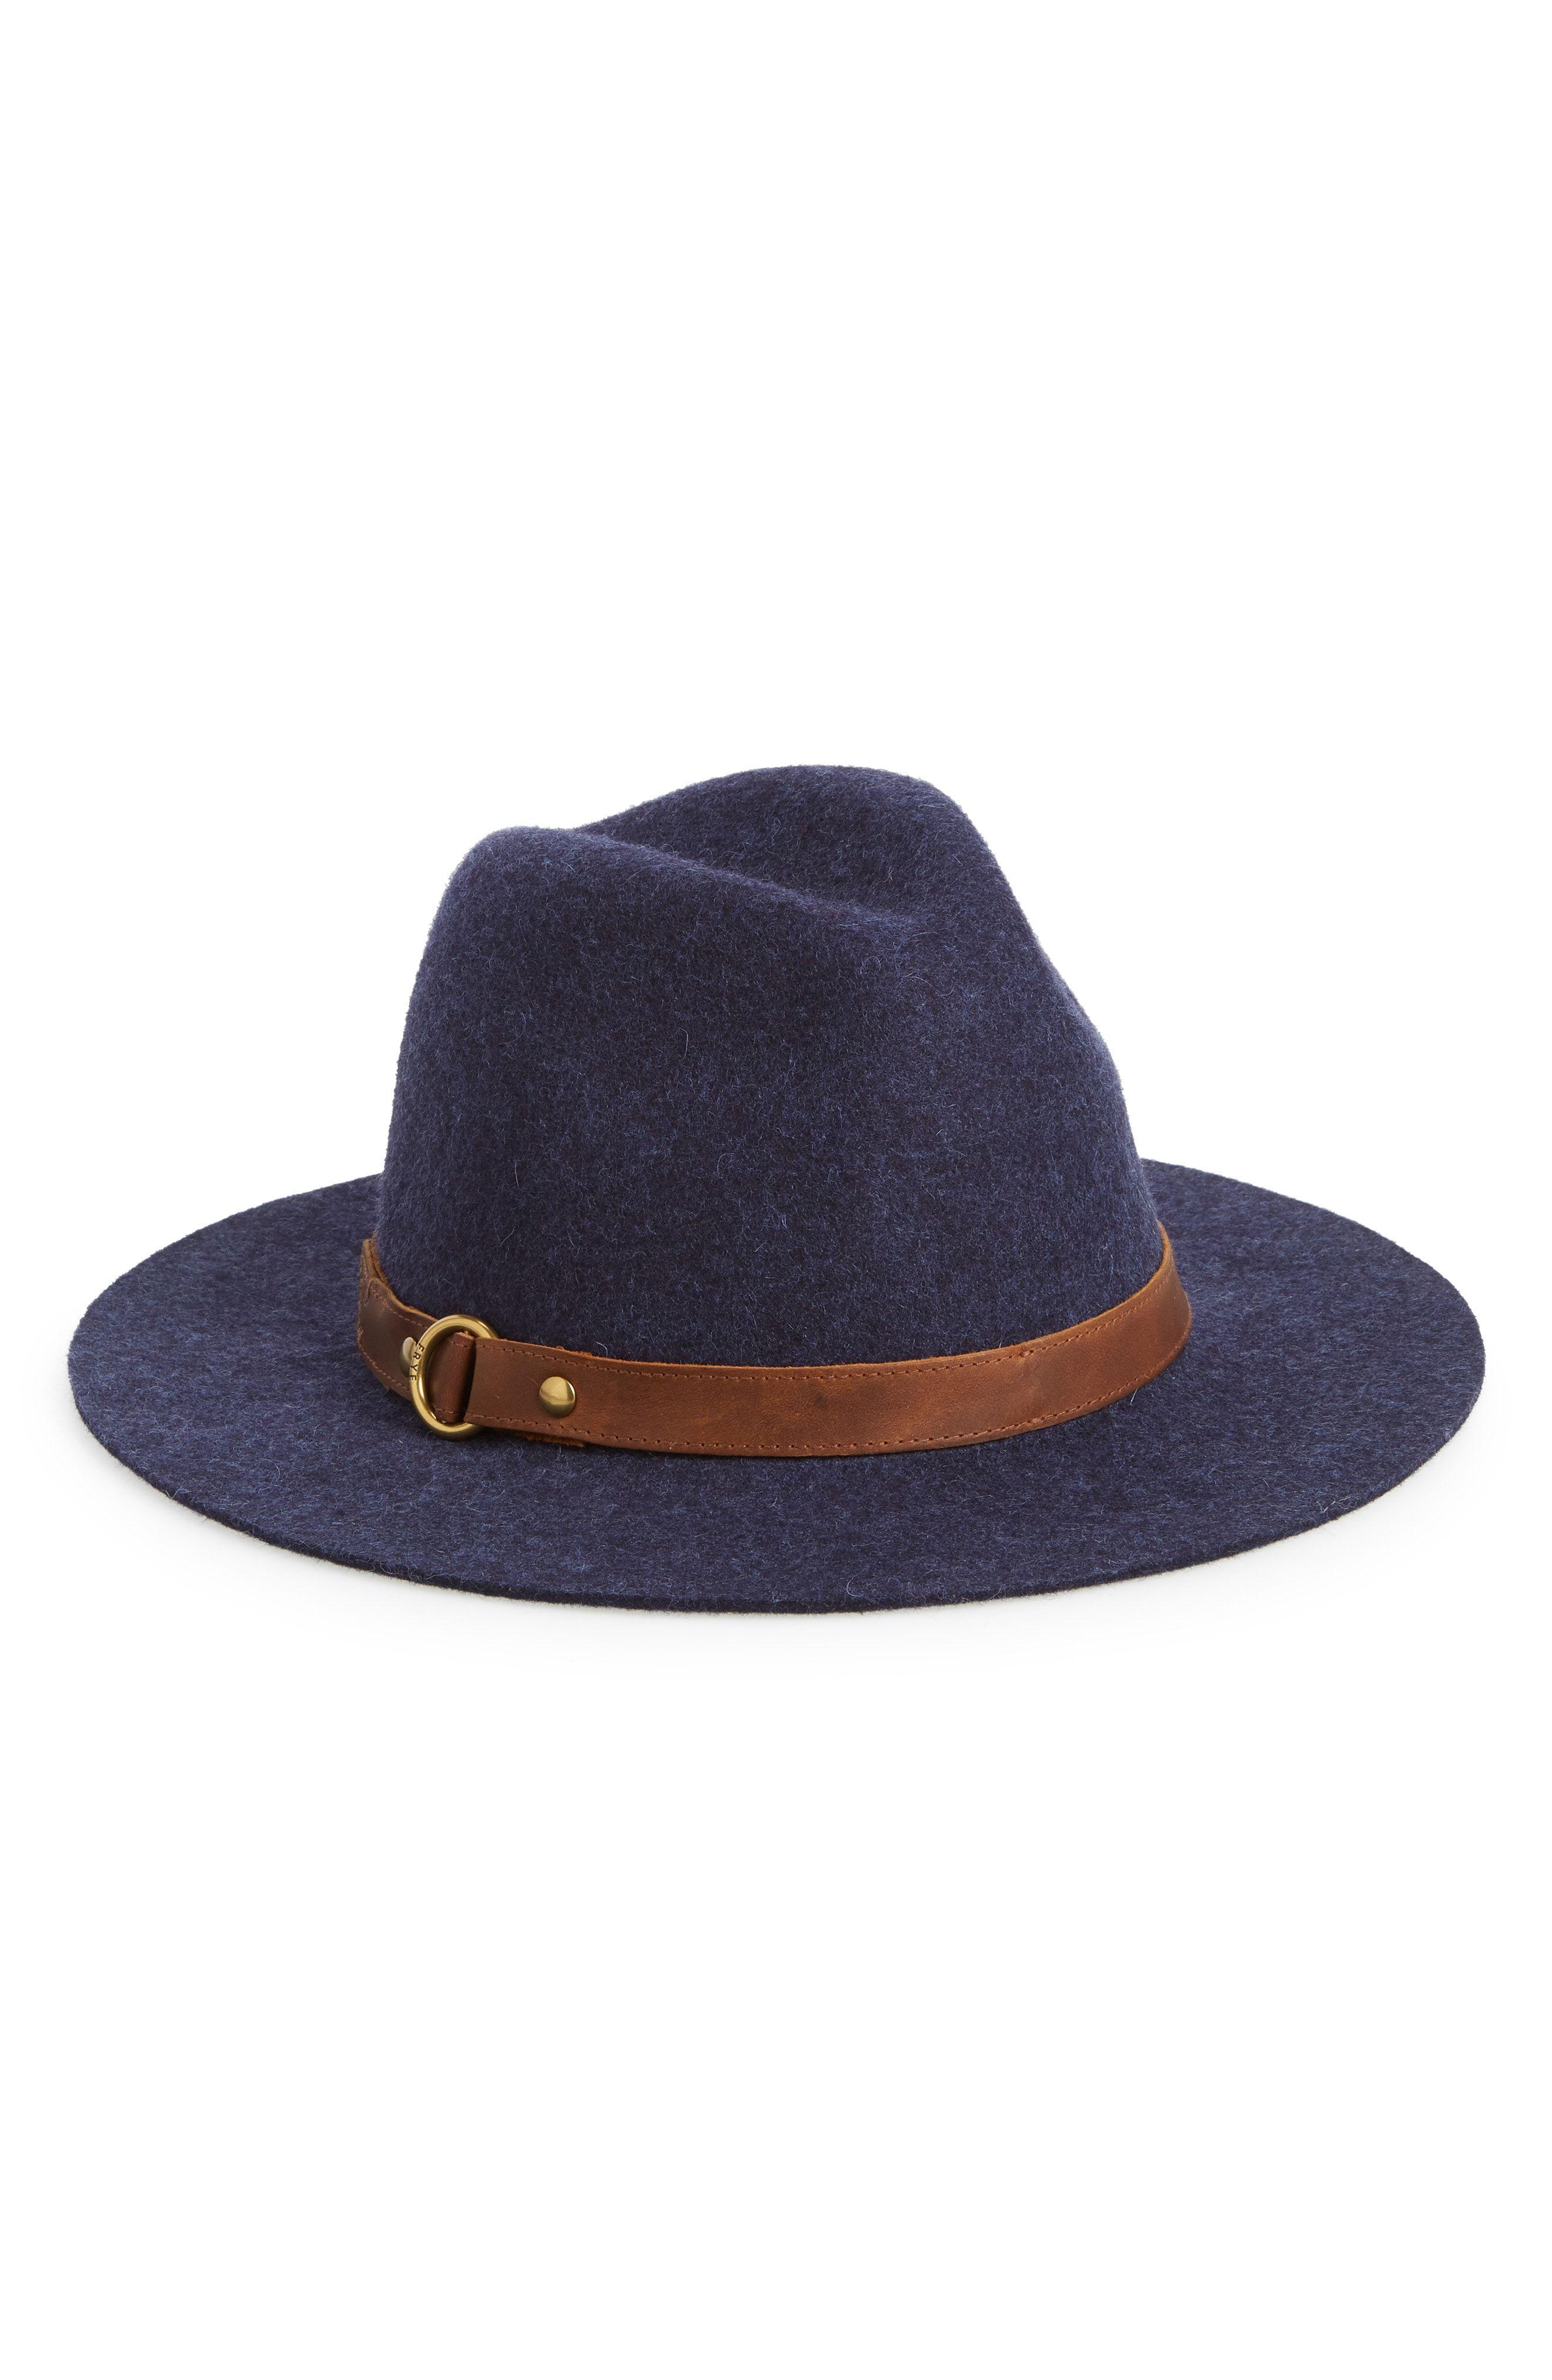 6fbc4205 15 Best Summer Hats 2019 - Stylish Summer Hats for Women